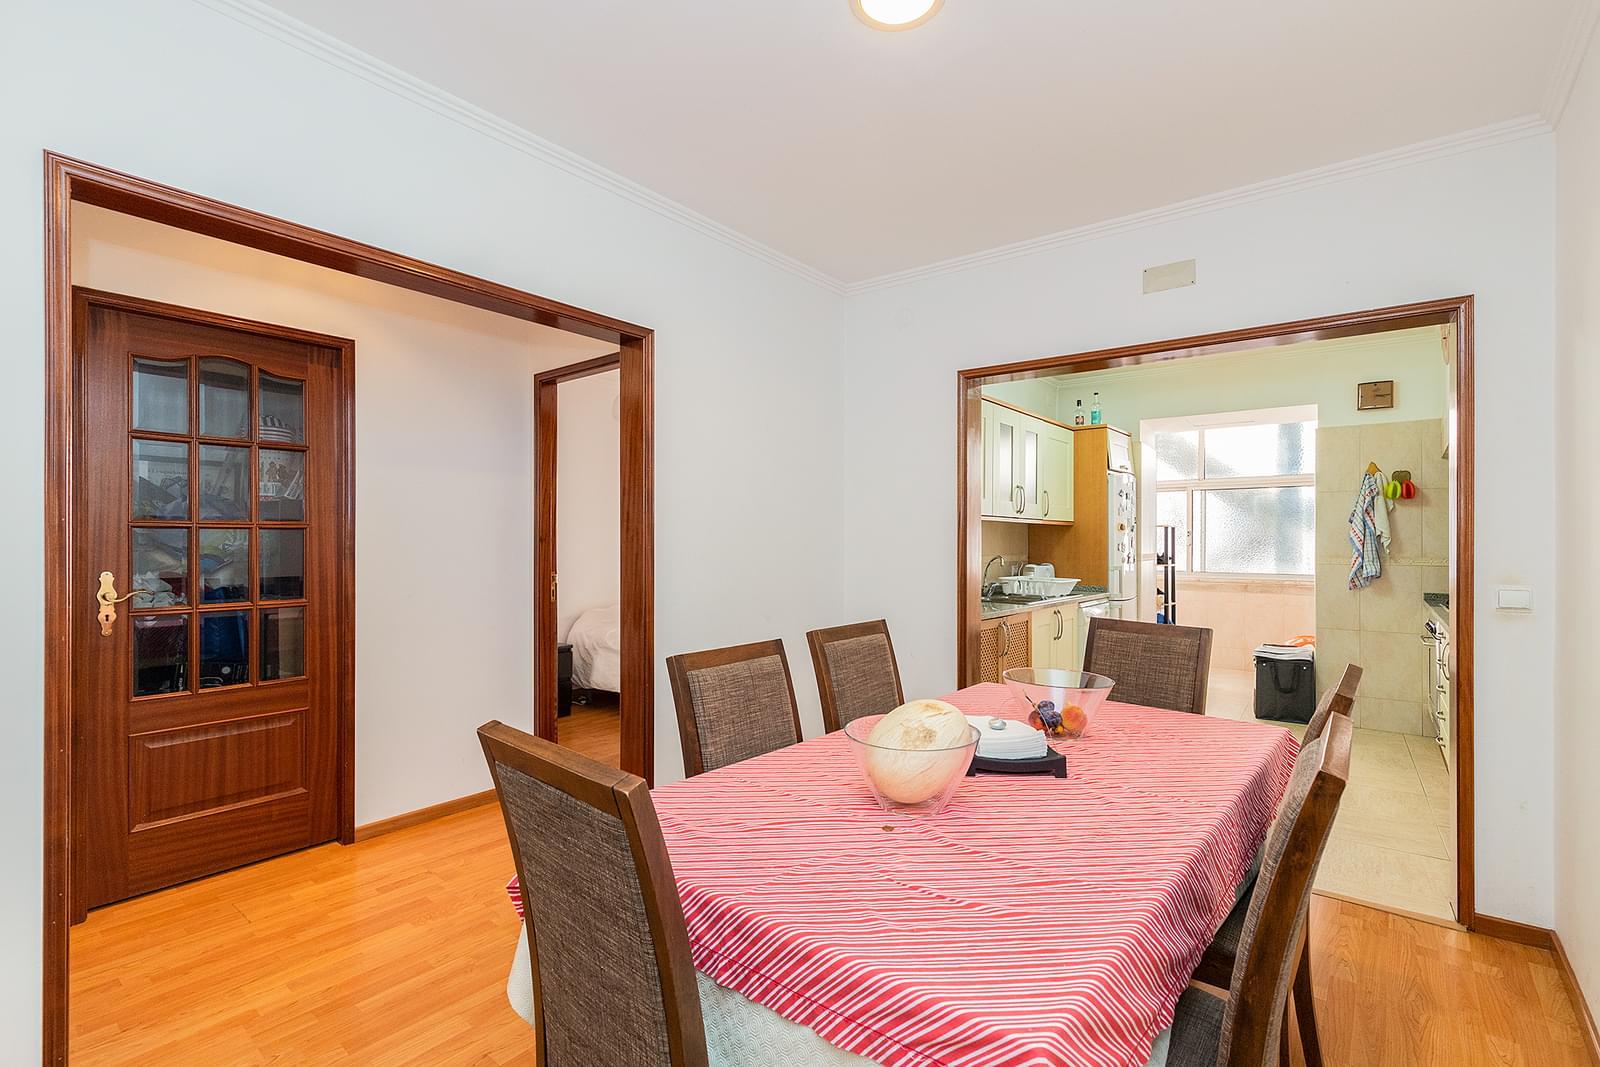 pf17978-apartamento-t3-lisboa-2c13ba57-5f56-4f04-b67e-a6980f985bf5